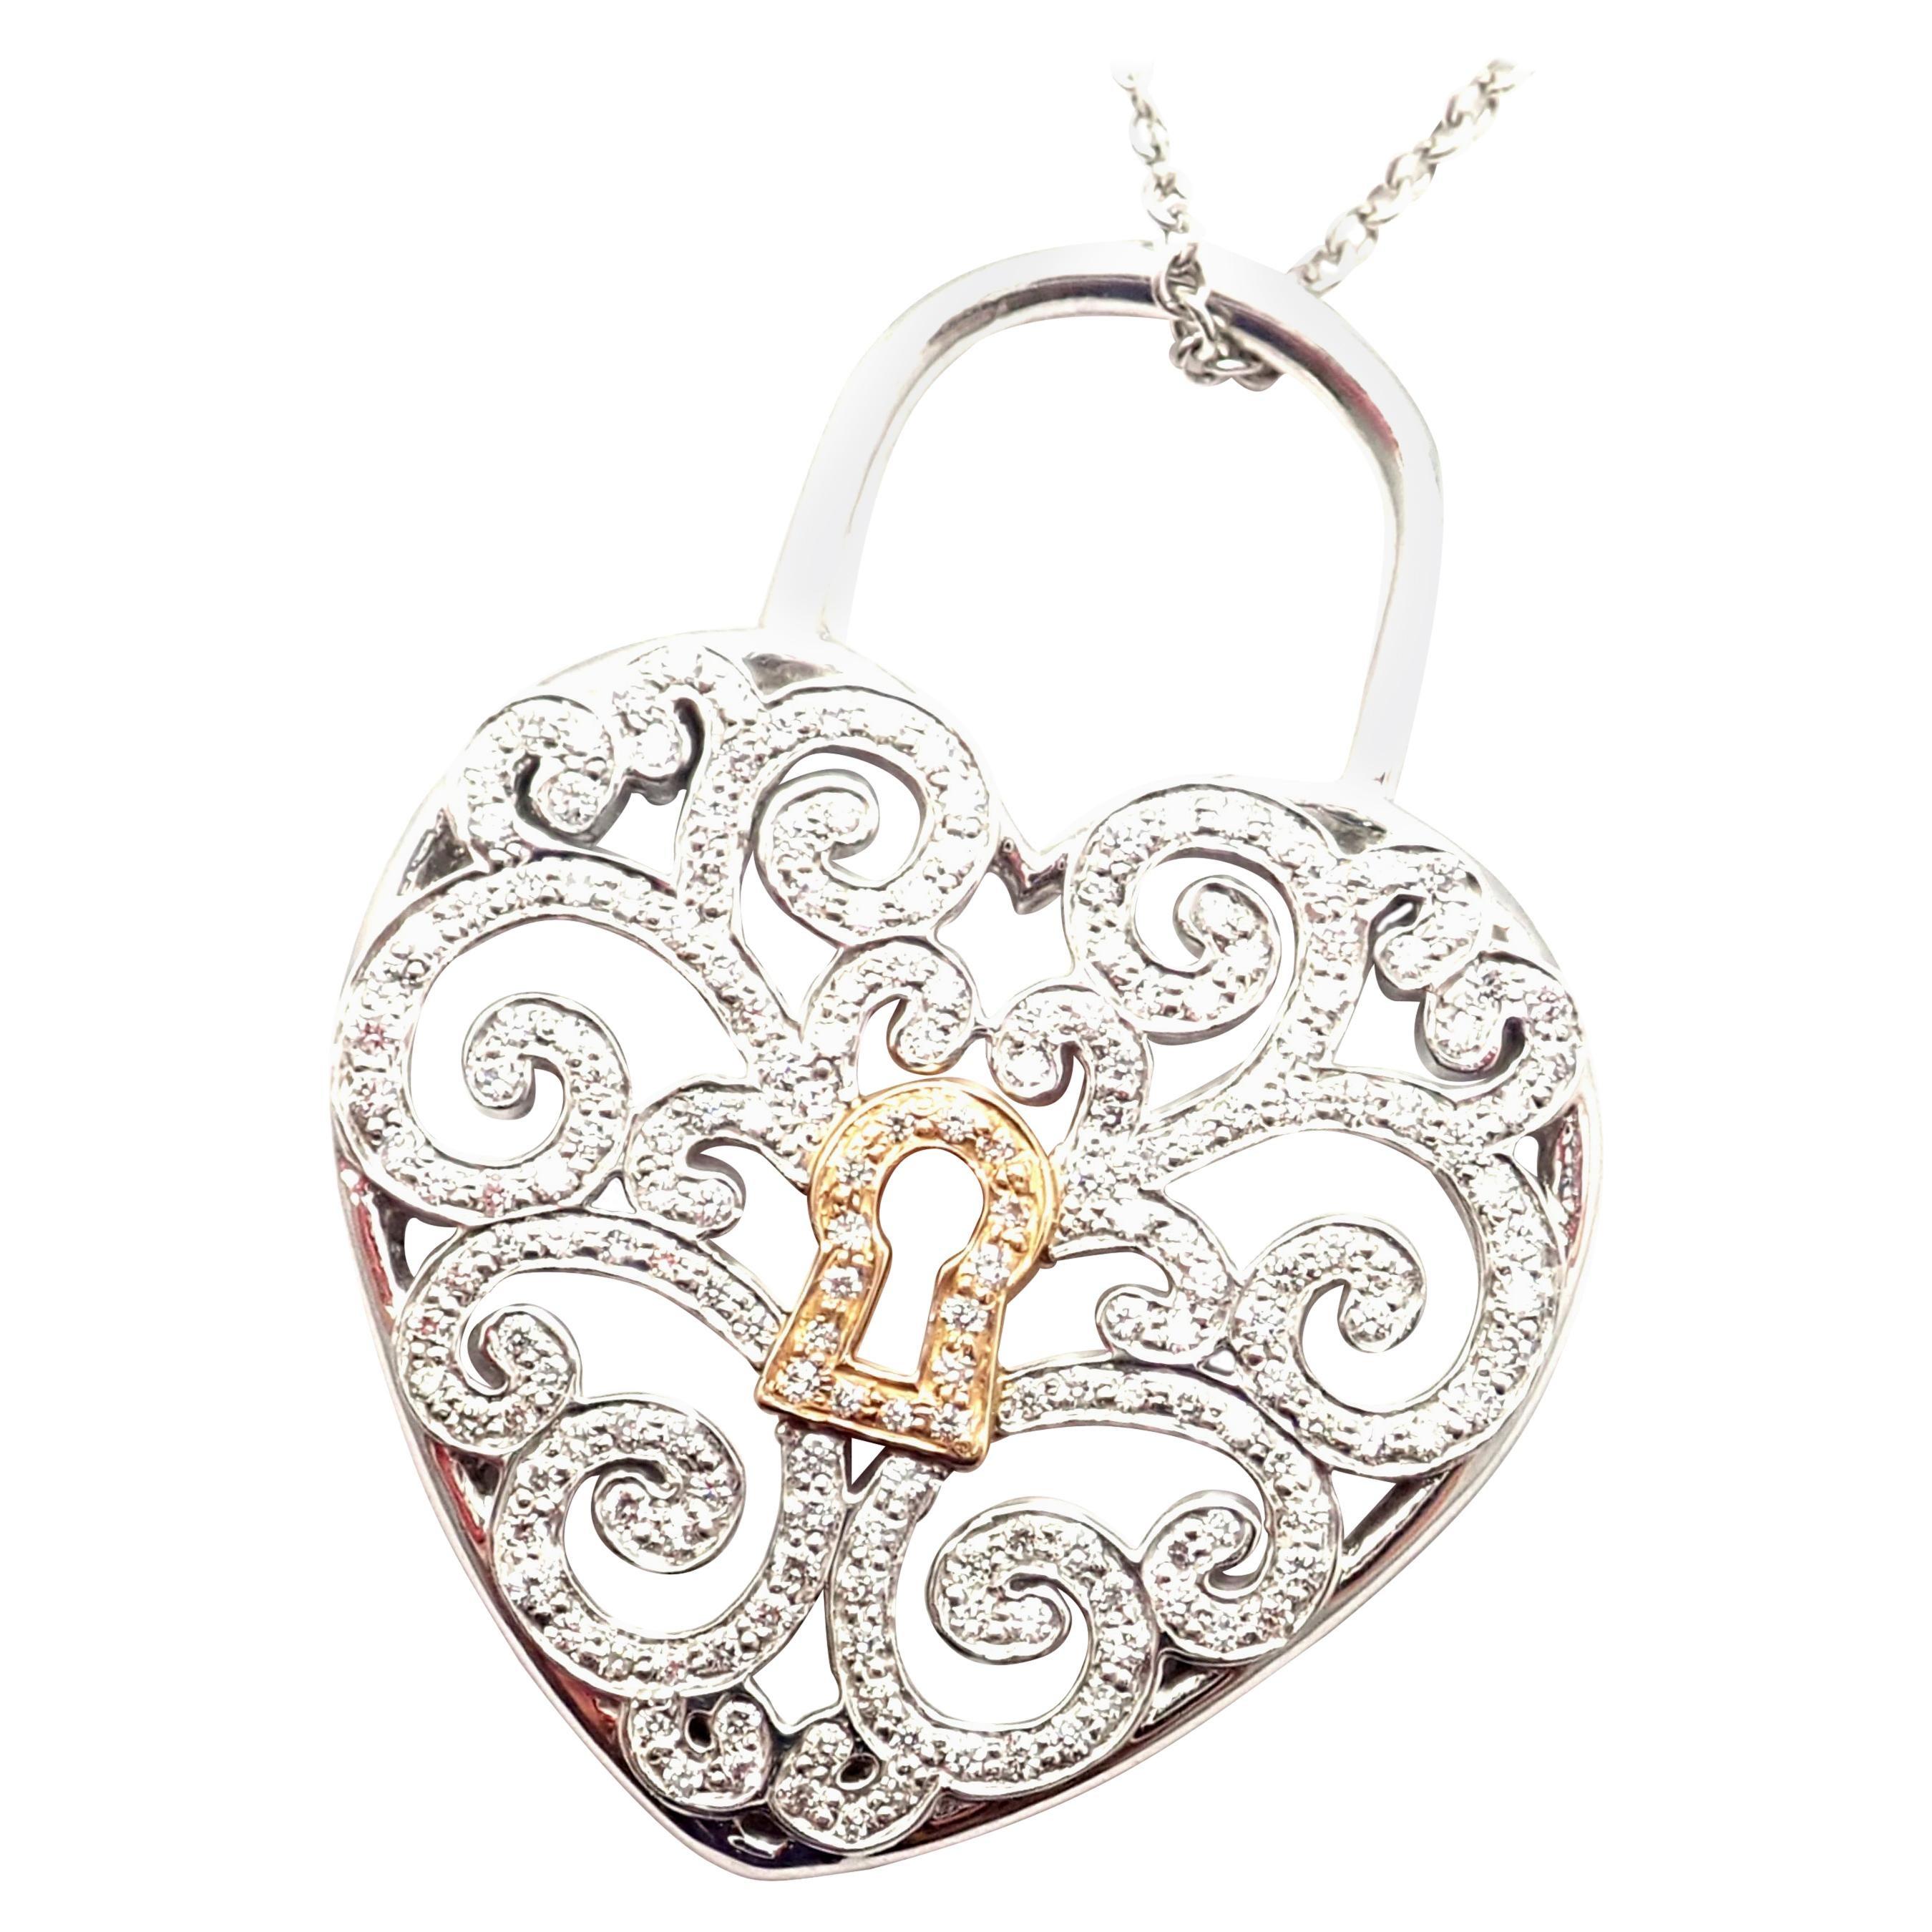 Tiffany & Co. Enchant Diamond Heart Lock Platinum Yellow Gold Pendant Necklace